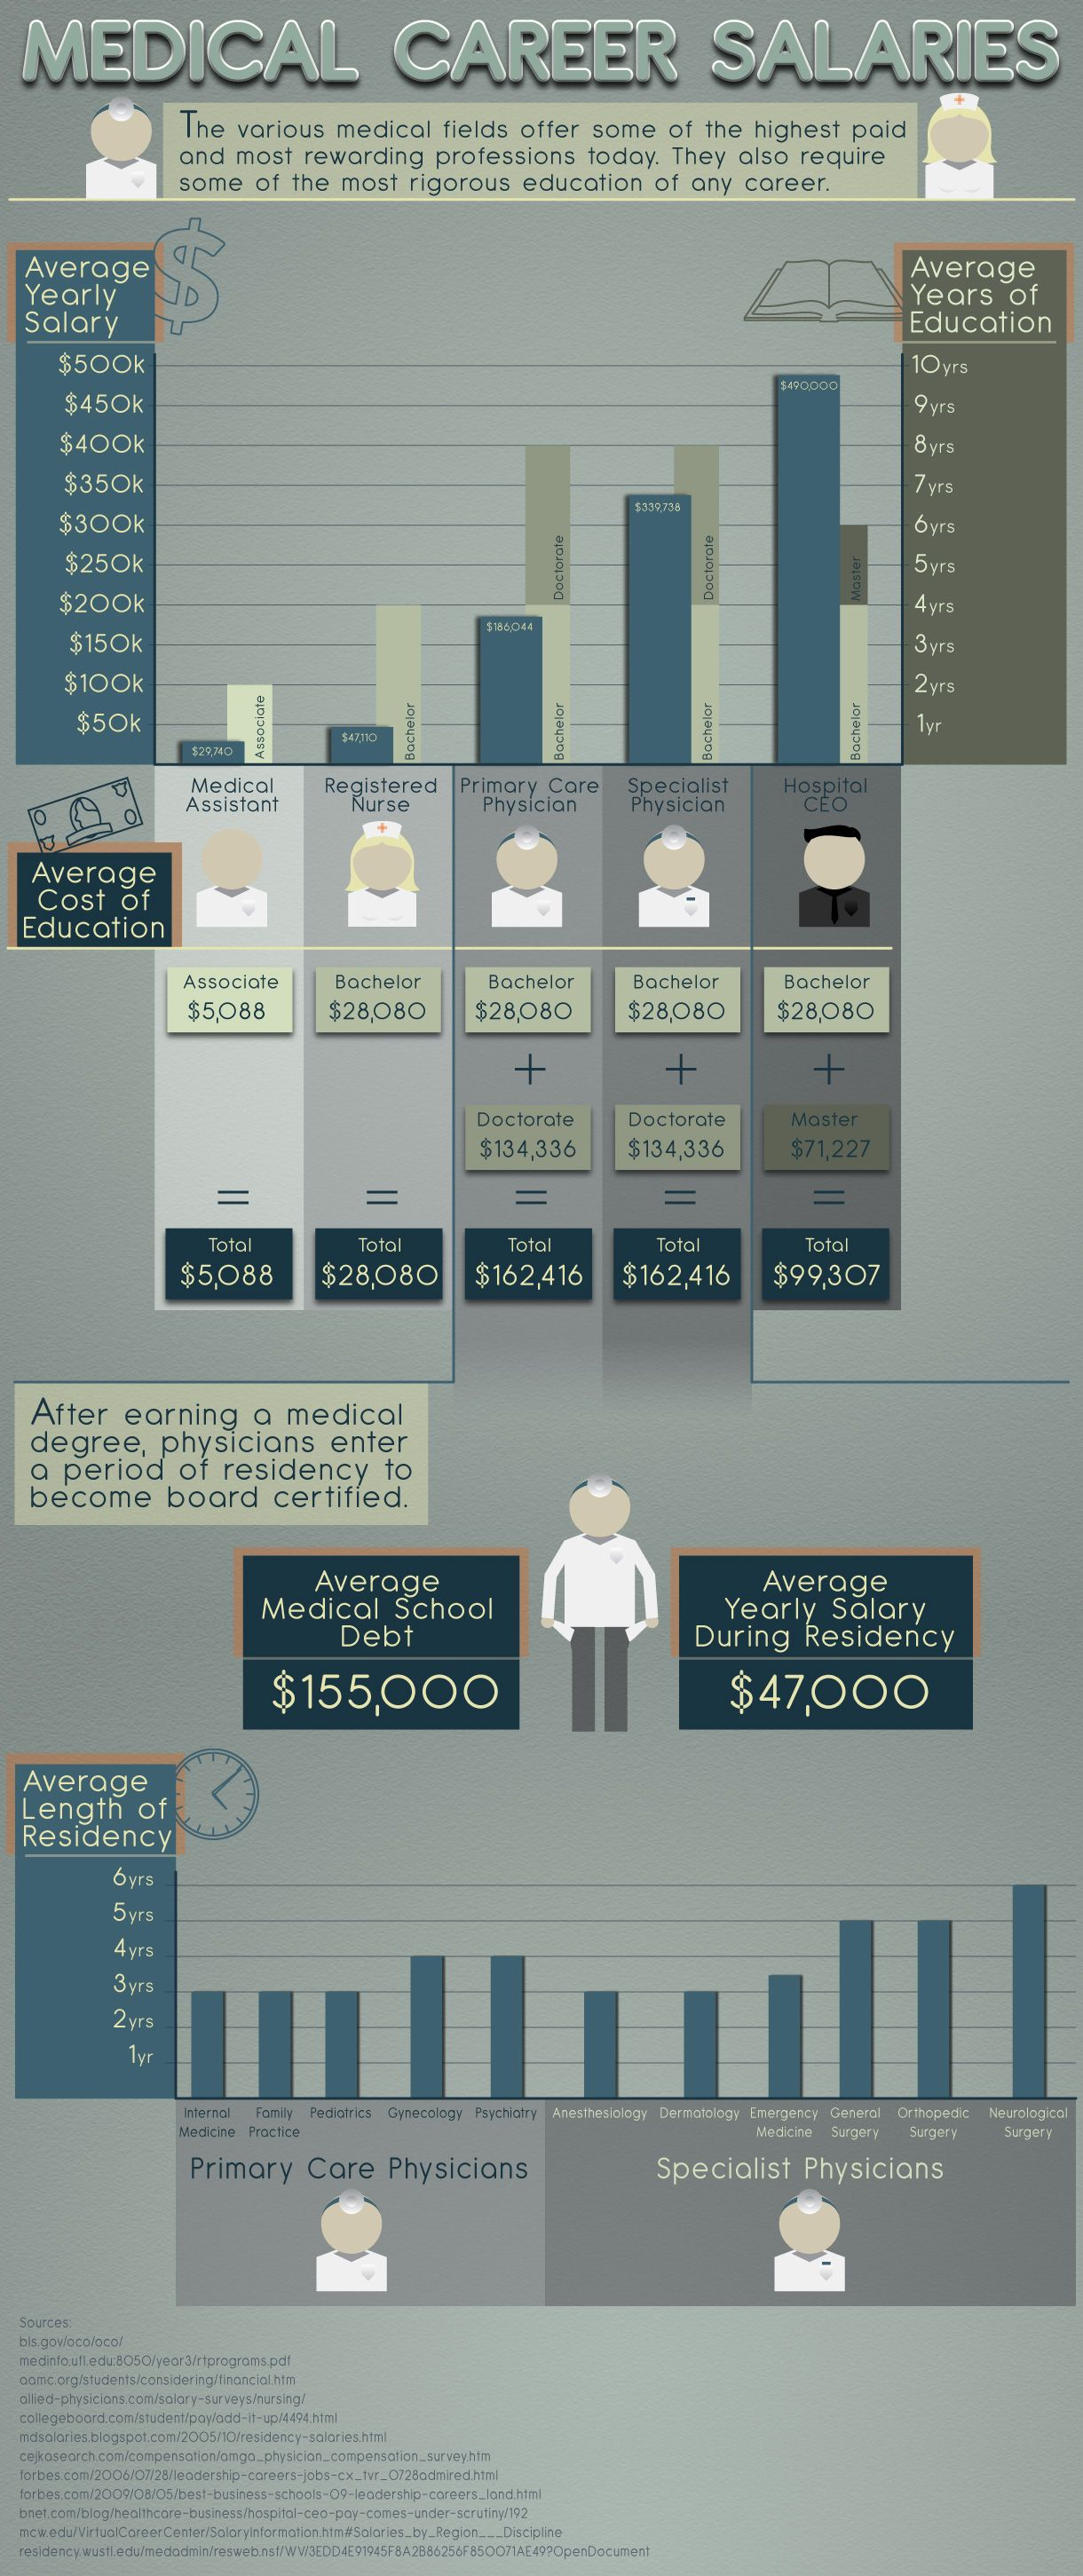 Medical Career Salaries Medical careers, Medical jobs